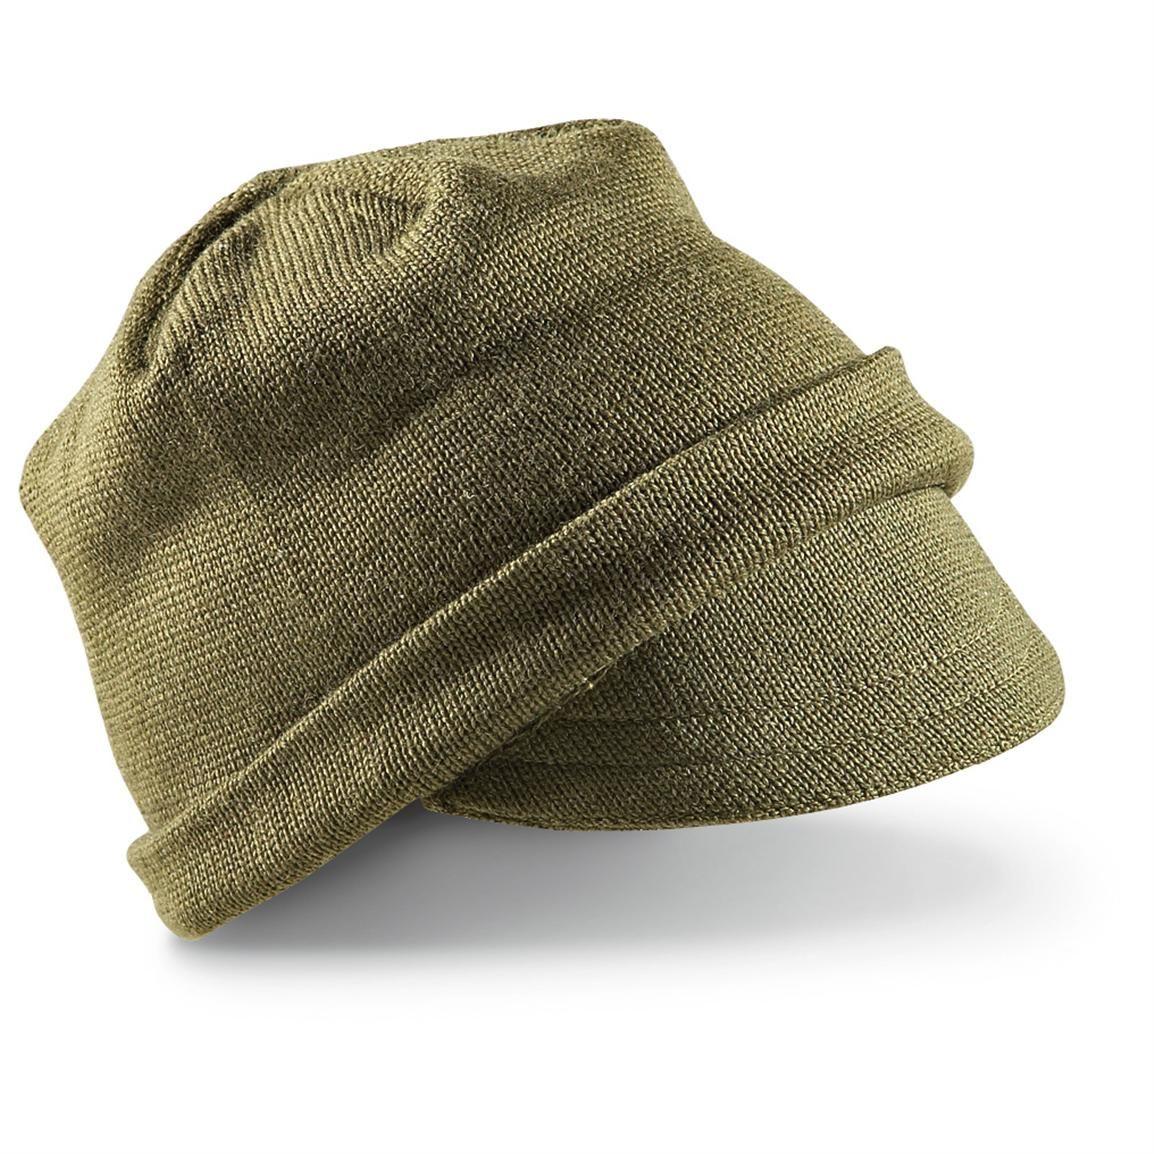 Italian Military Surplus Wool Watch Caps ... e3da4e51705